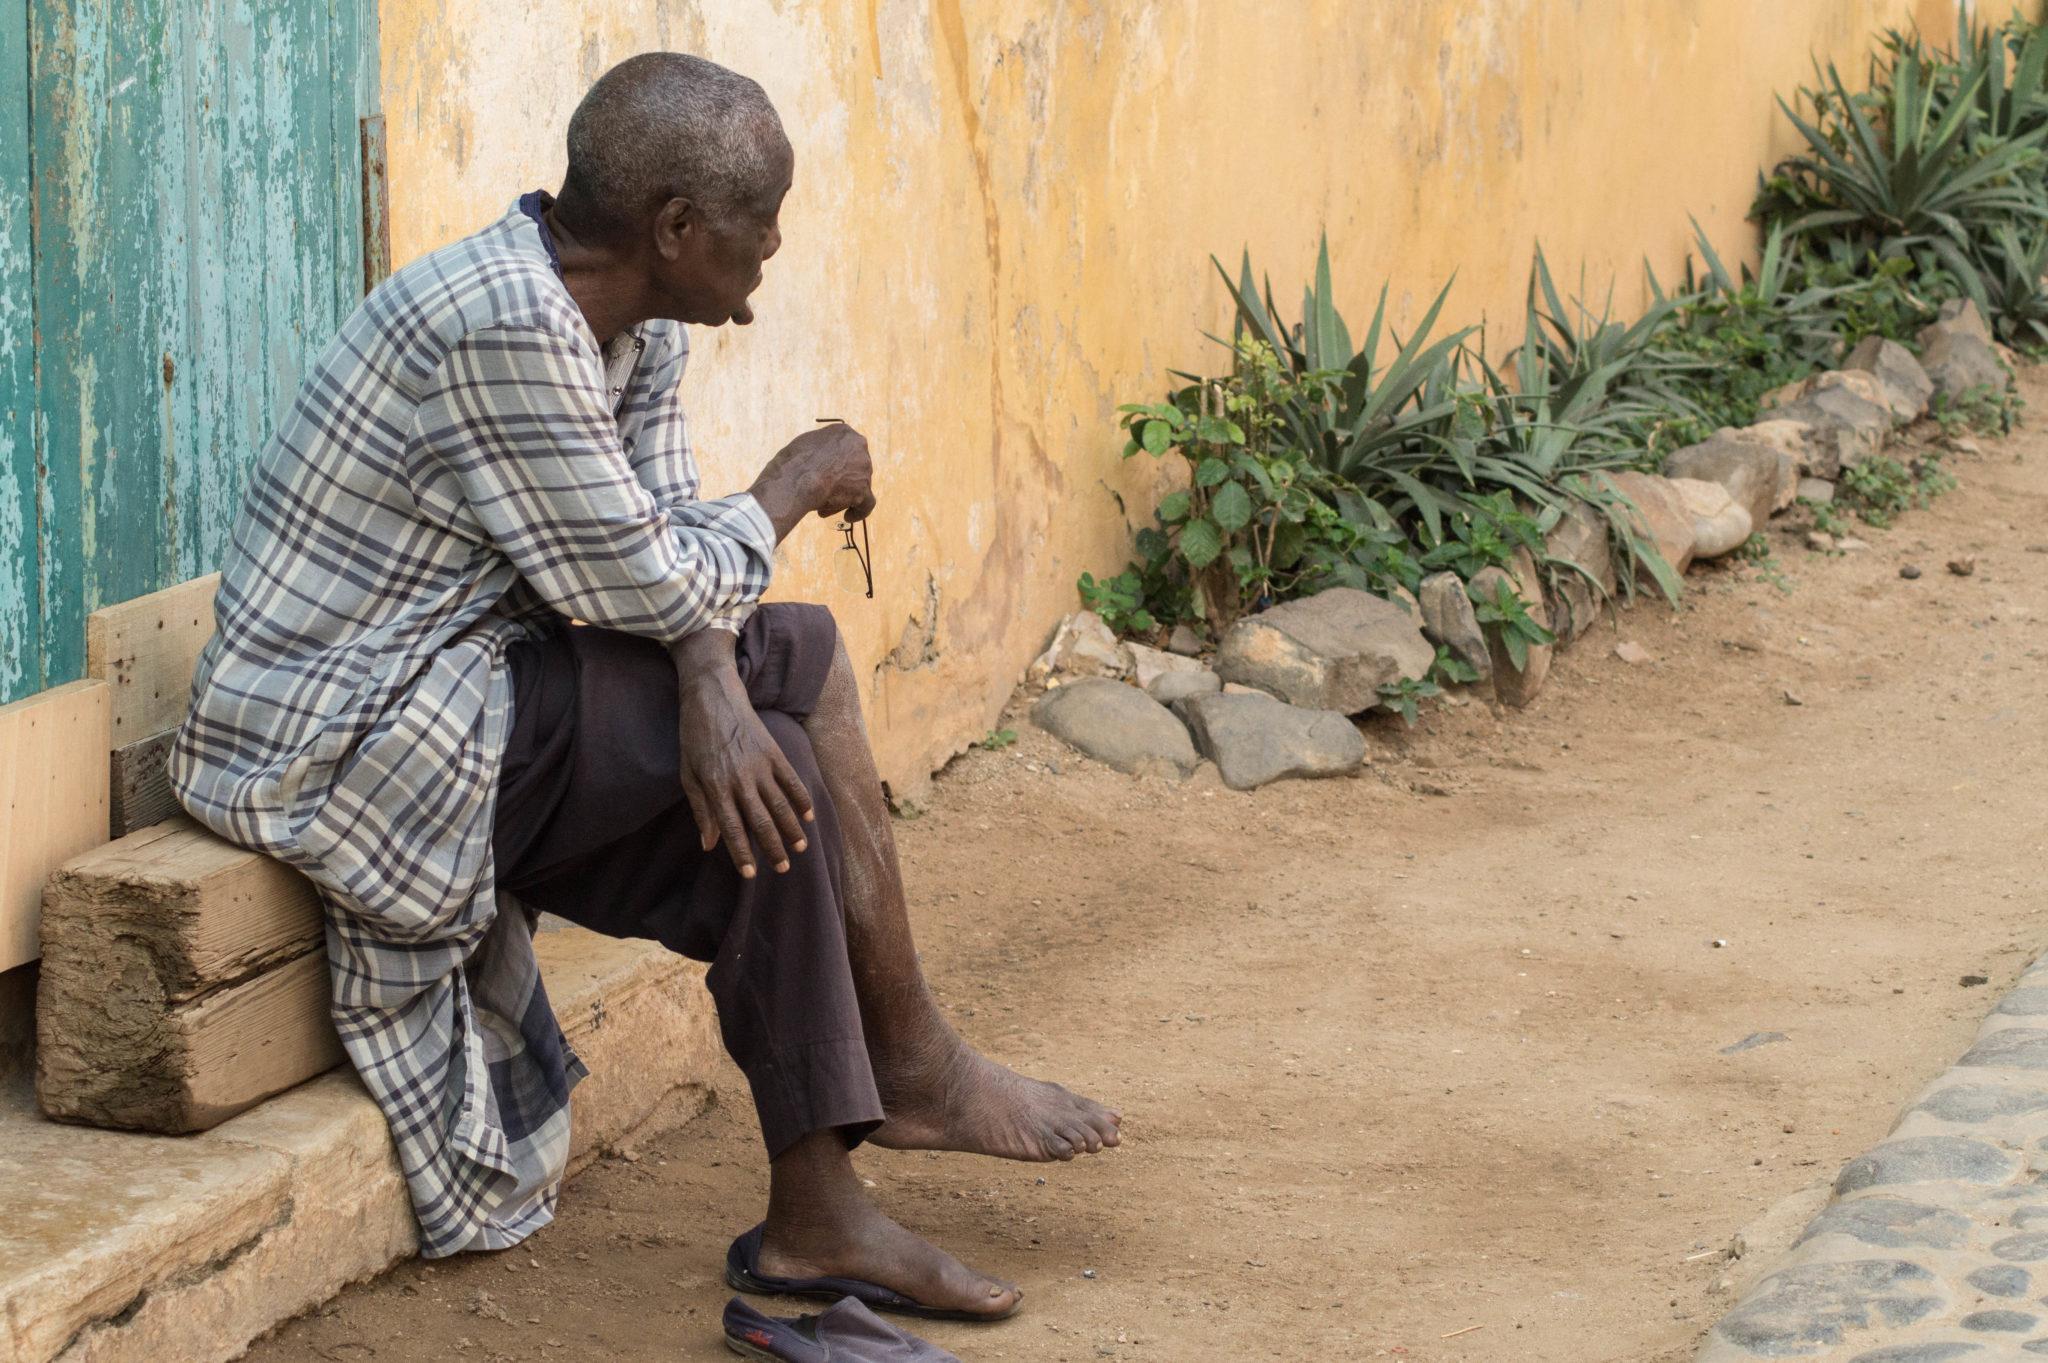 Senegal-Sehenswuerdigkeiten-Ile-de-Goree-Mann